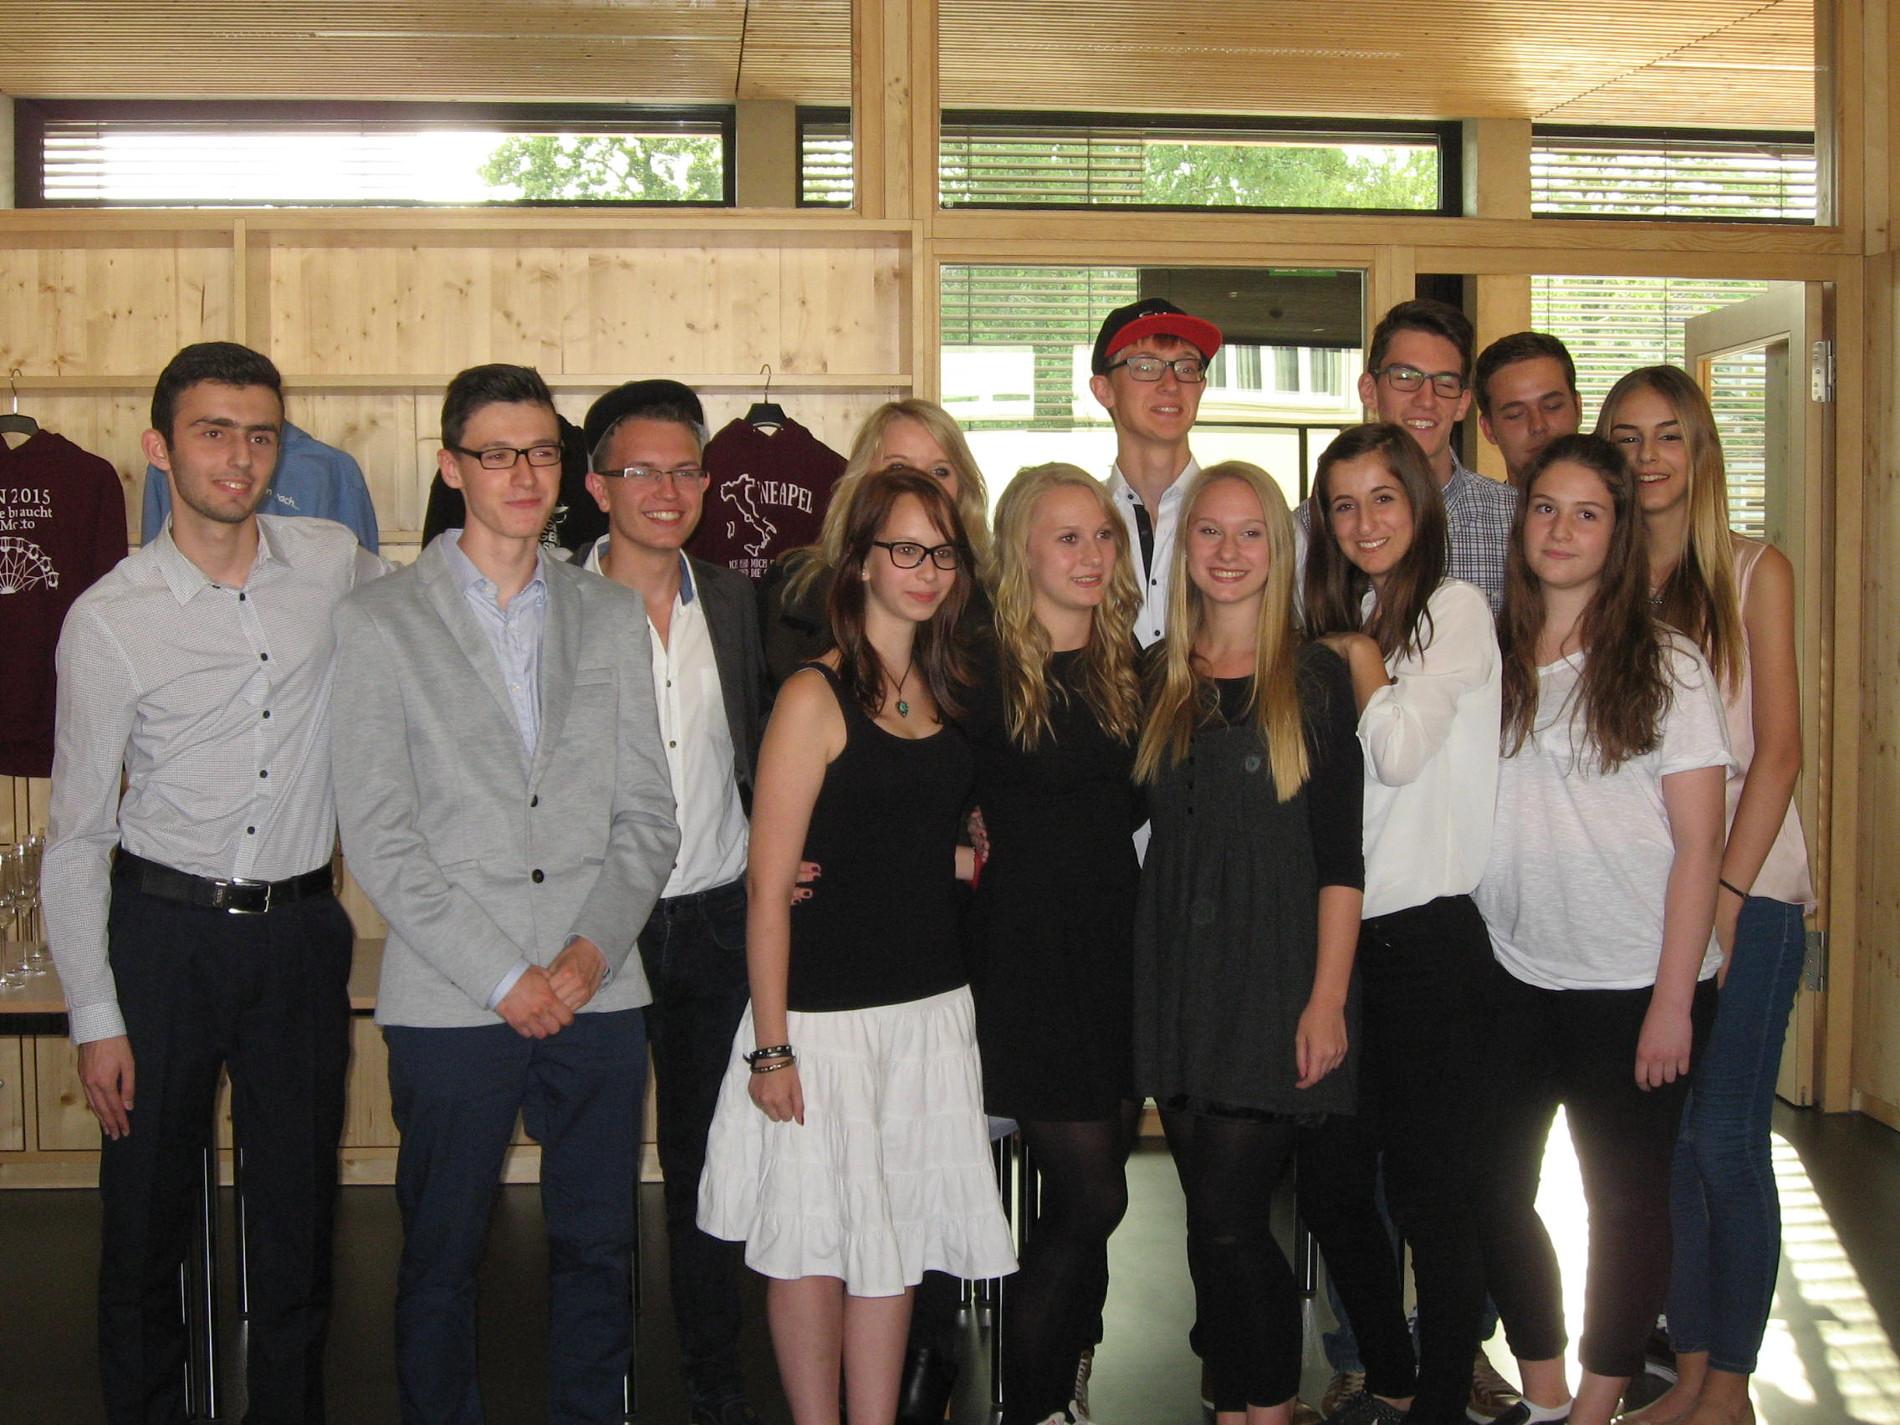 Schüler aus Kornwestheim spenden an CDV-Verein